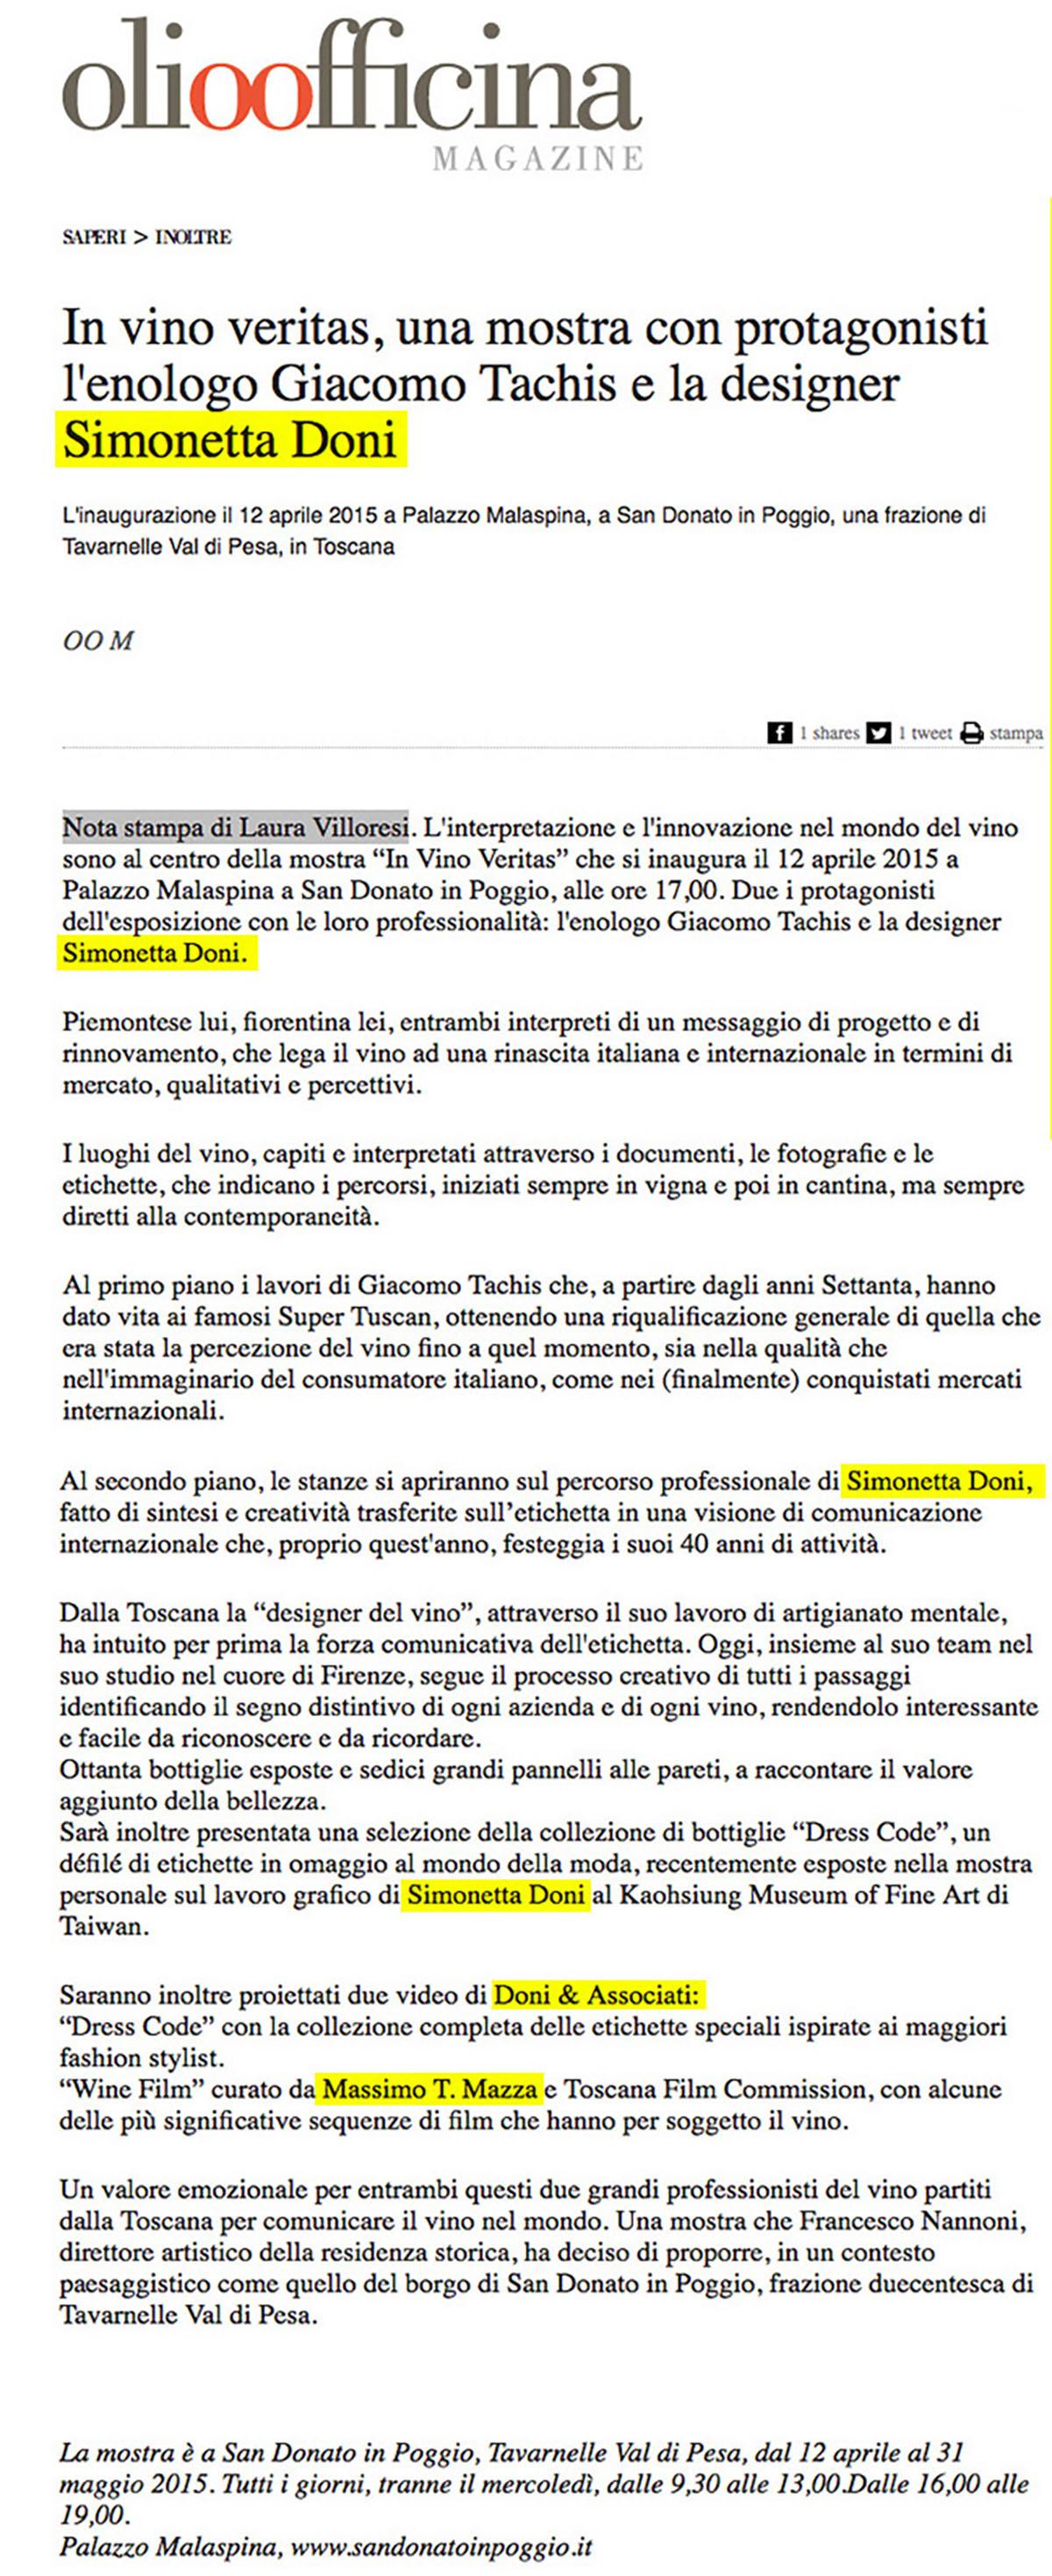 pubblicazione-oliofficina-invinoveritas